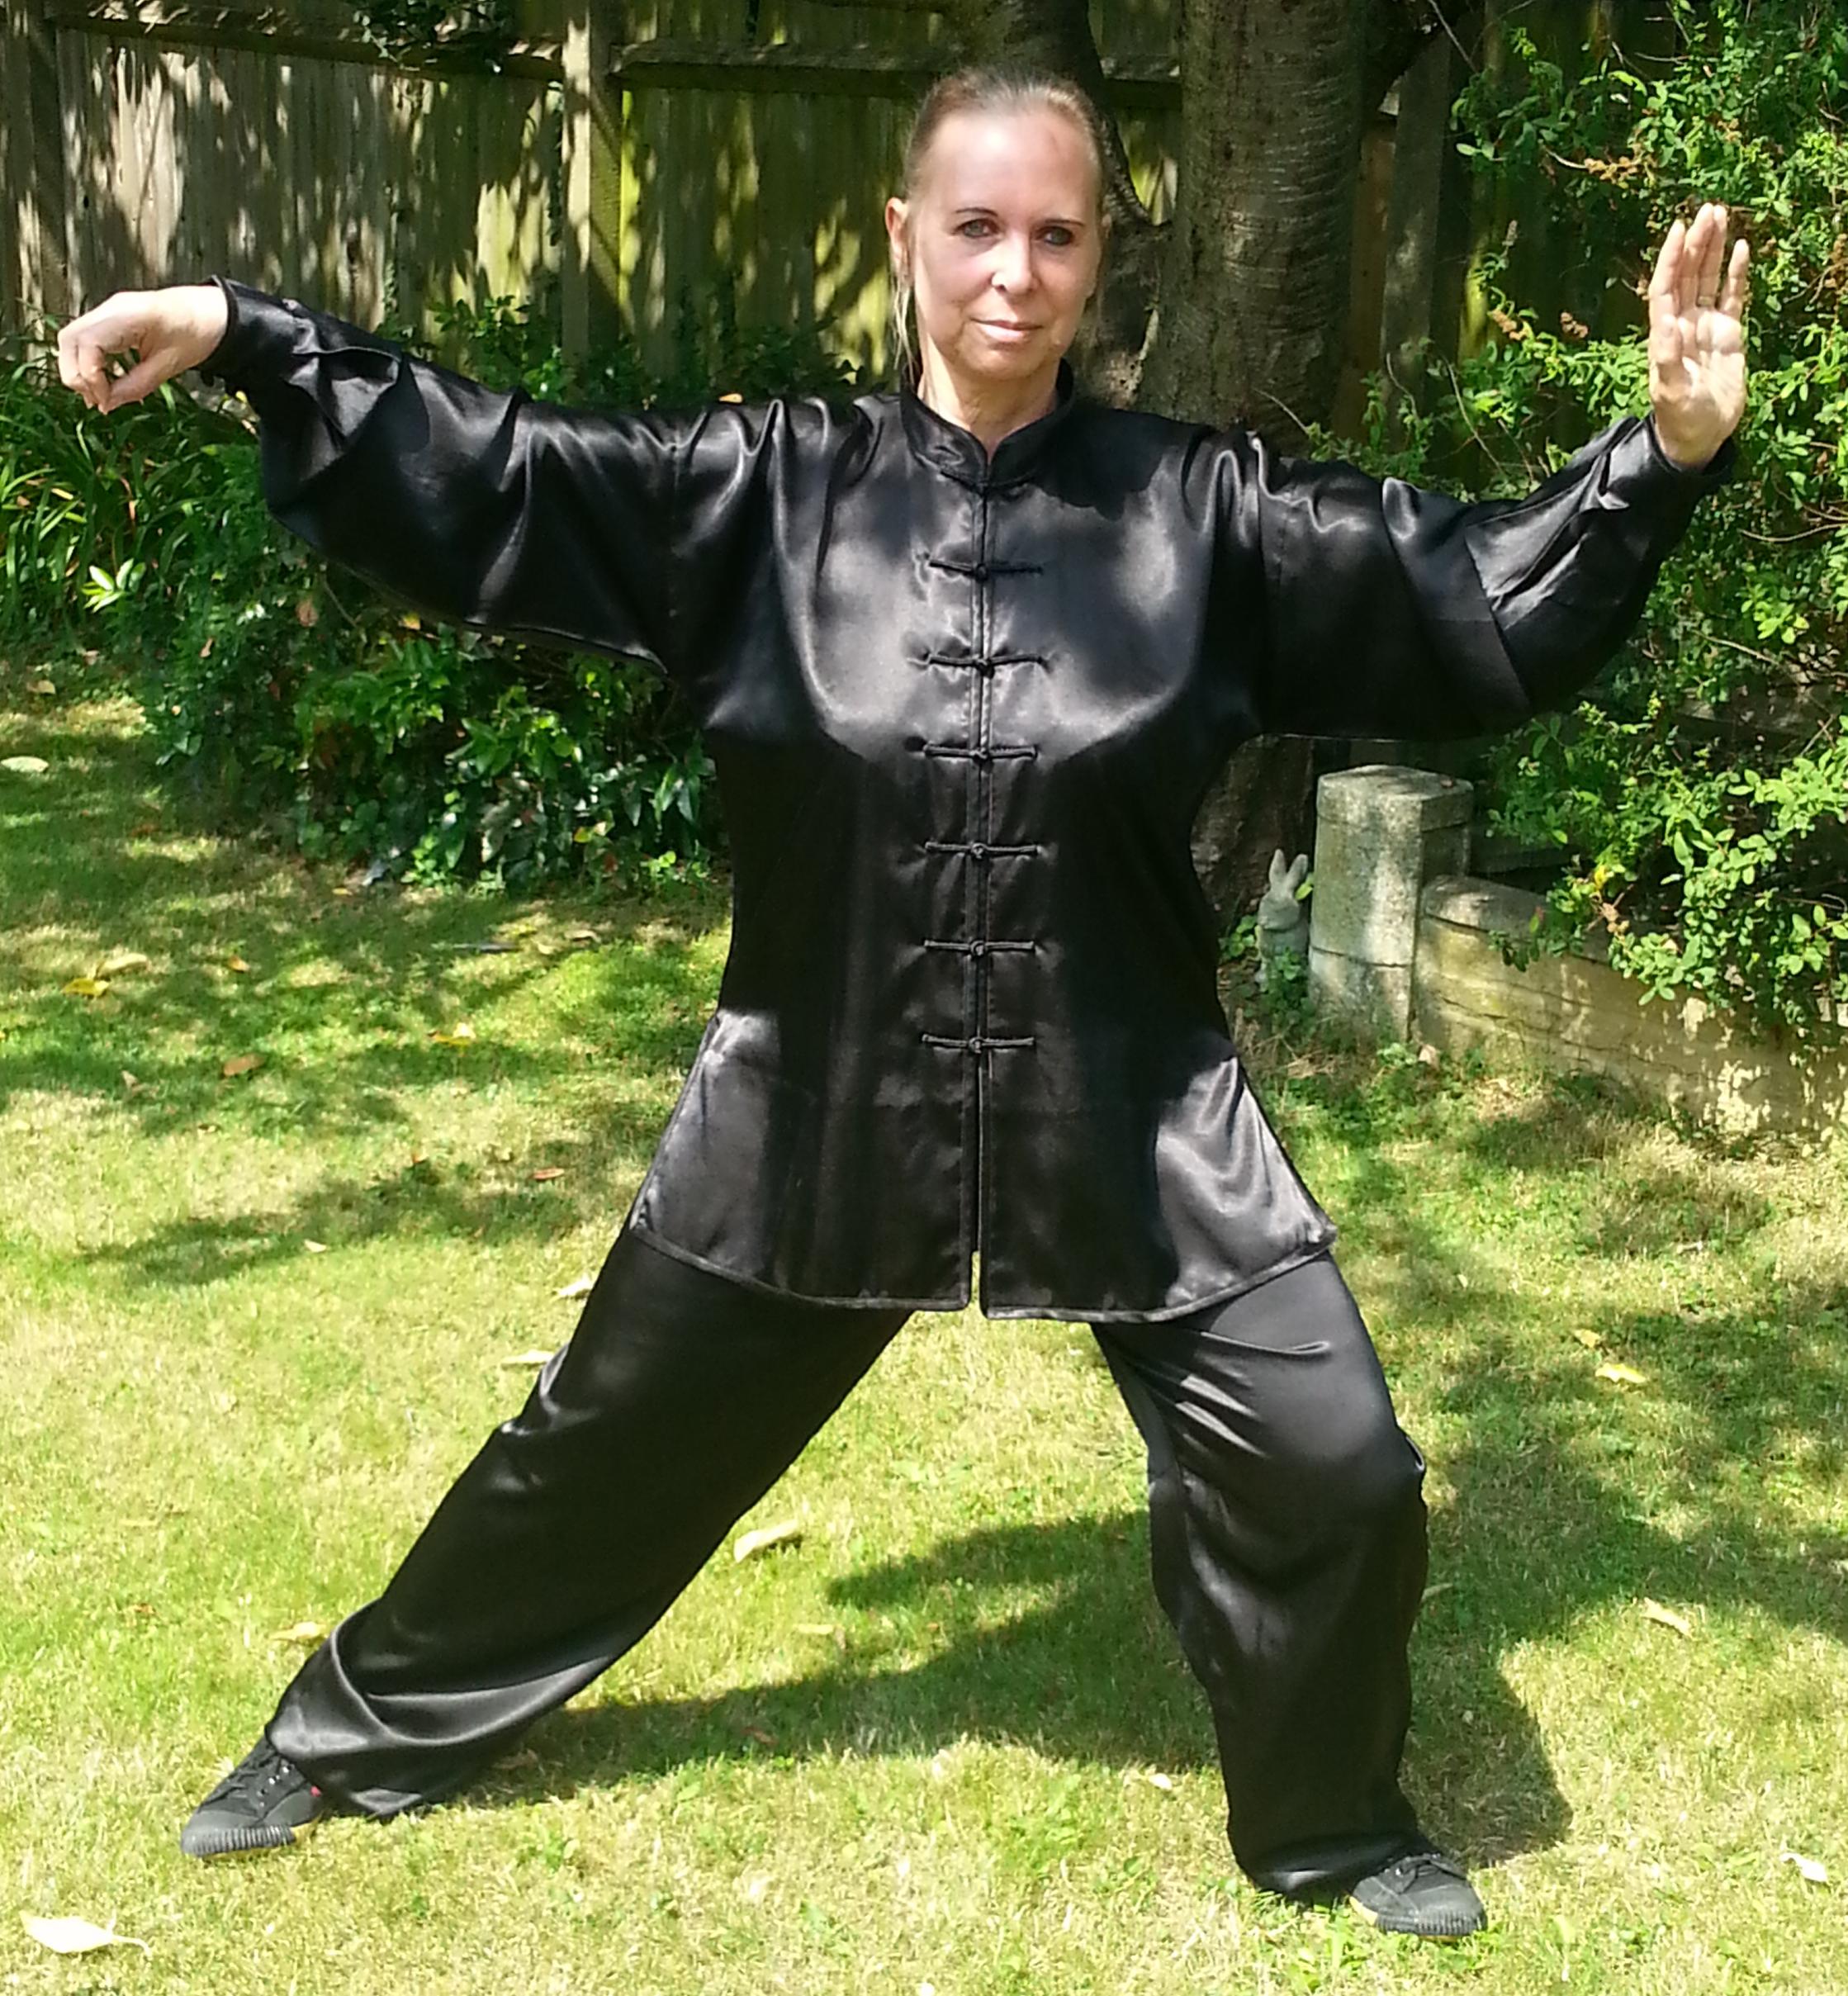 Shaolin Culture Shifu Sandra Bromley Tai Chi Classes